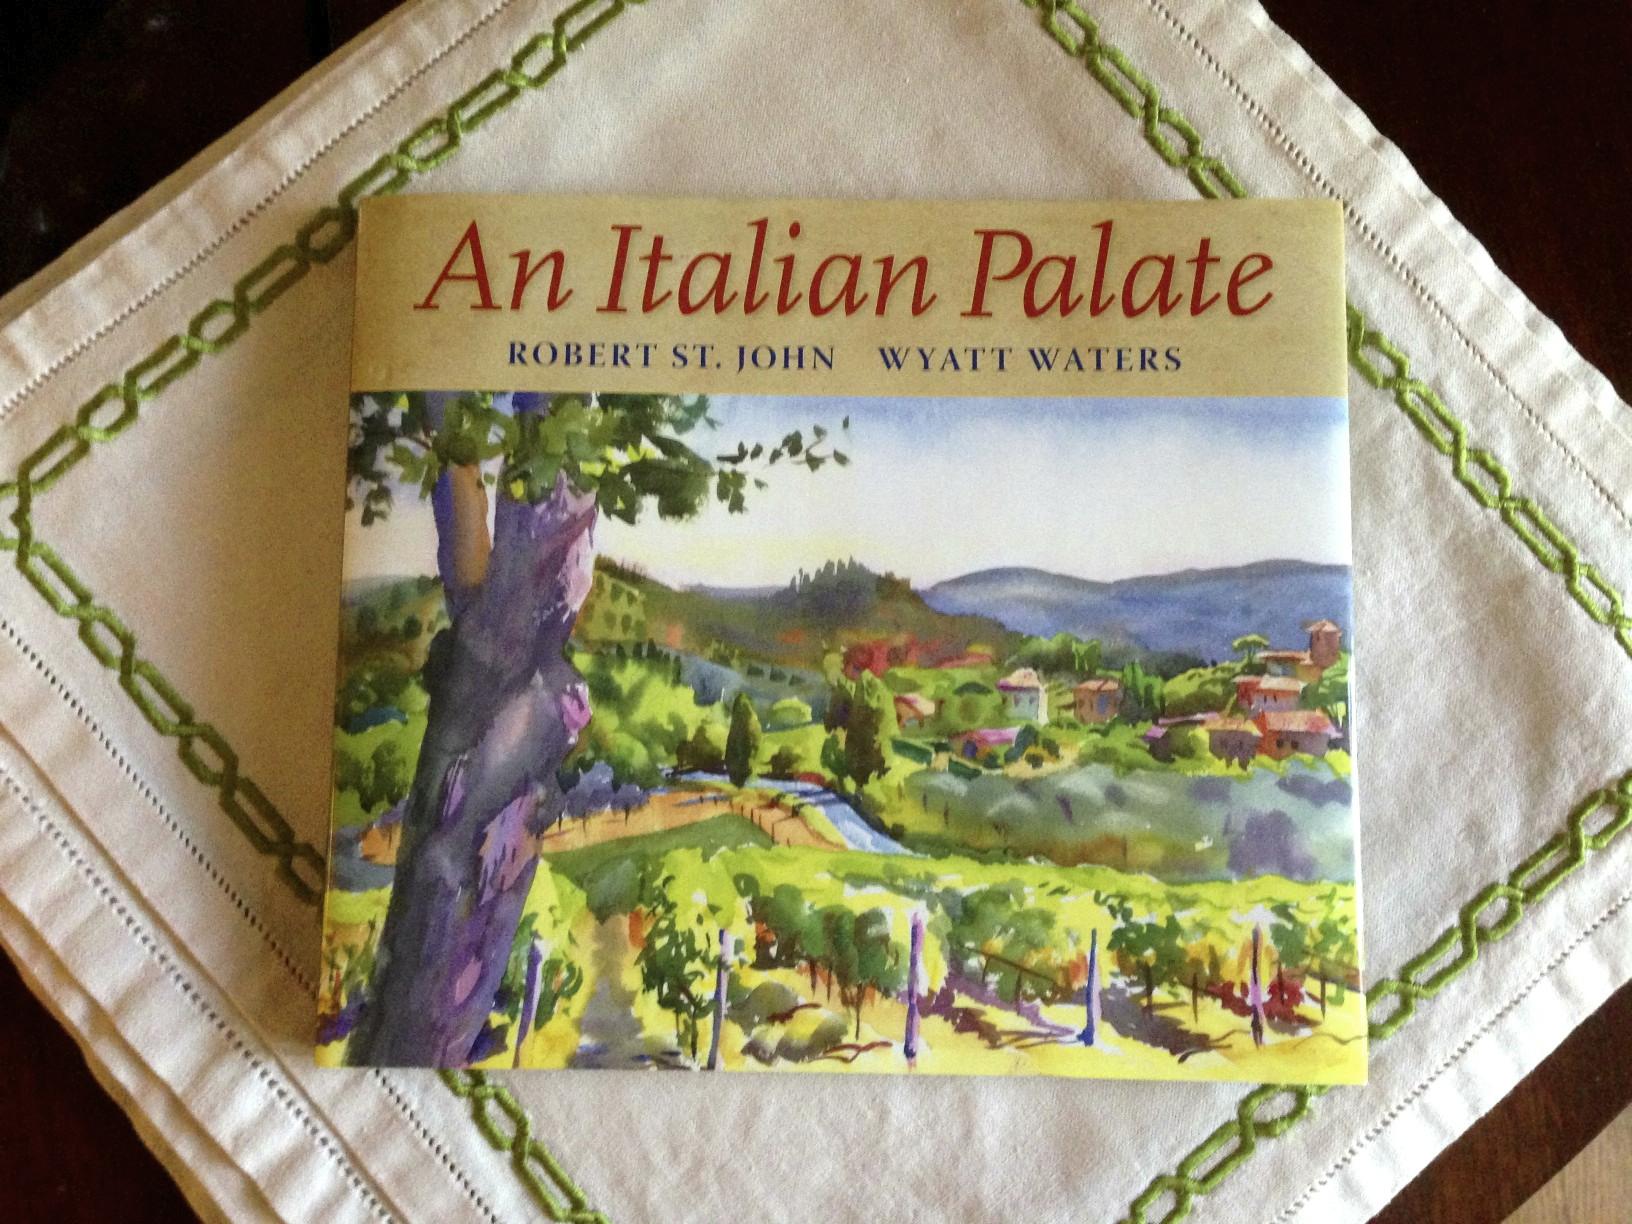 An Italian Palate